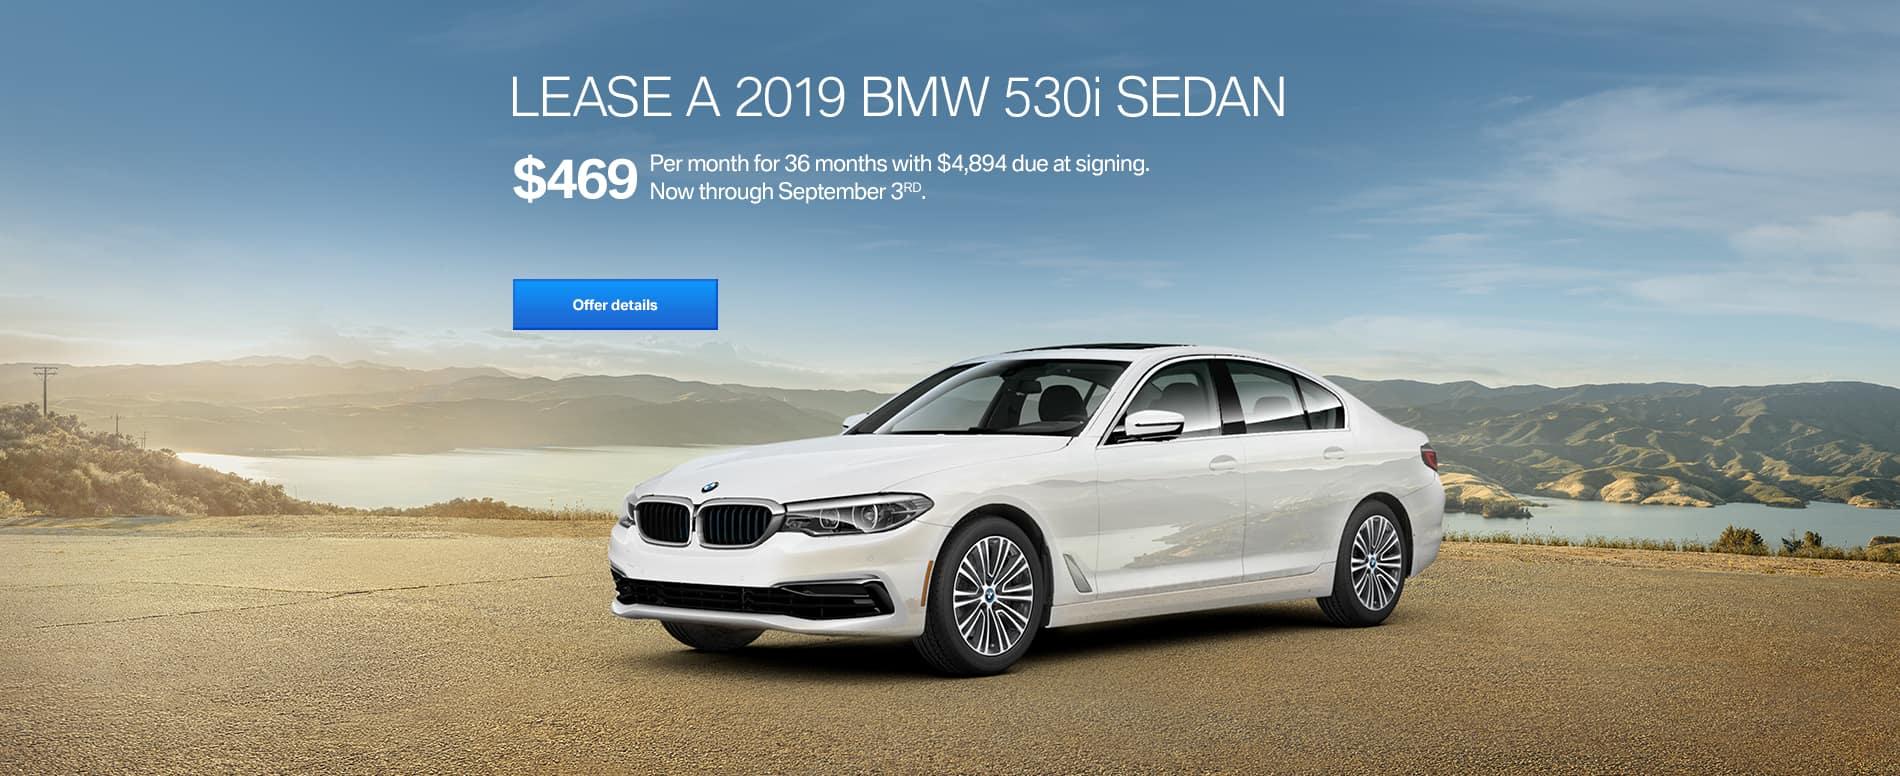 AUGUST_PUSH_2019_BMW_530i_469